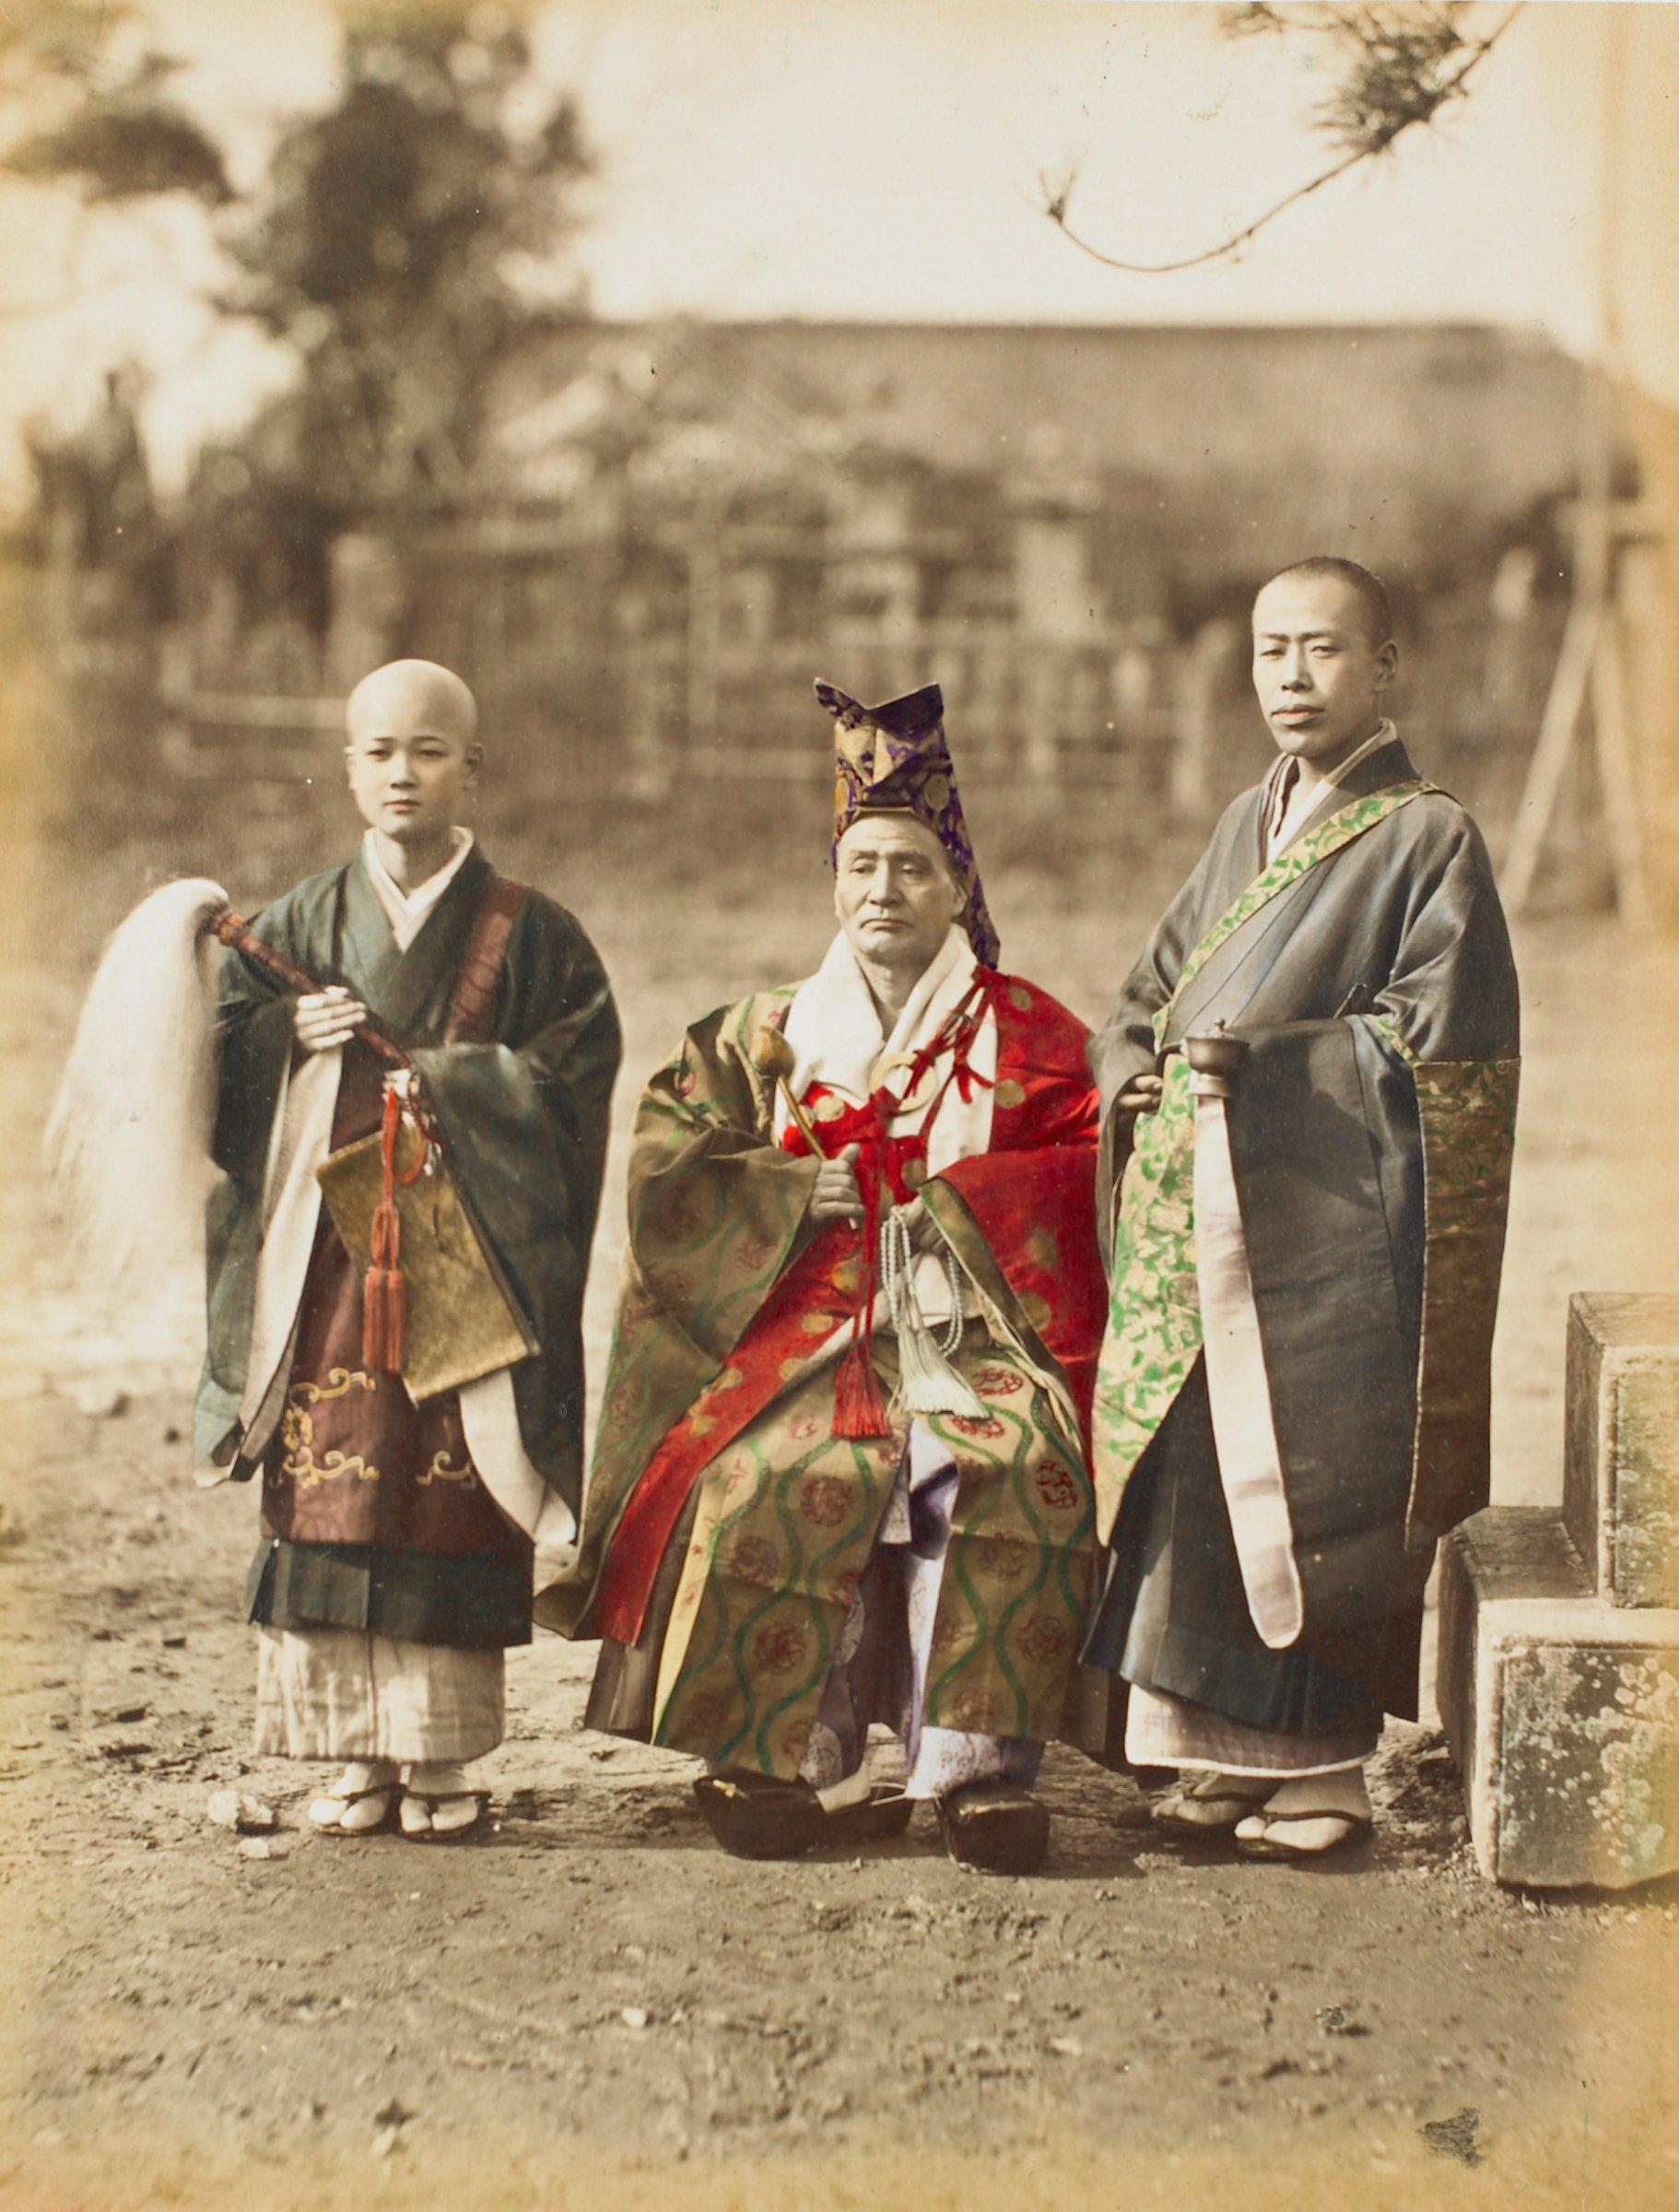 Buddha Priests (recto); Sanjinko Nikko (verso), Attributed to Kusakabe Kimbei, hand-colored albumen prints